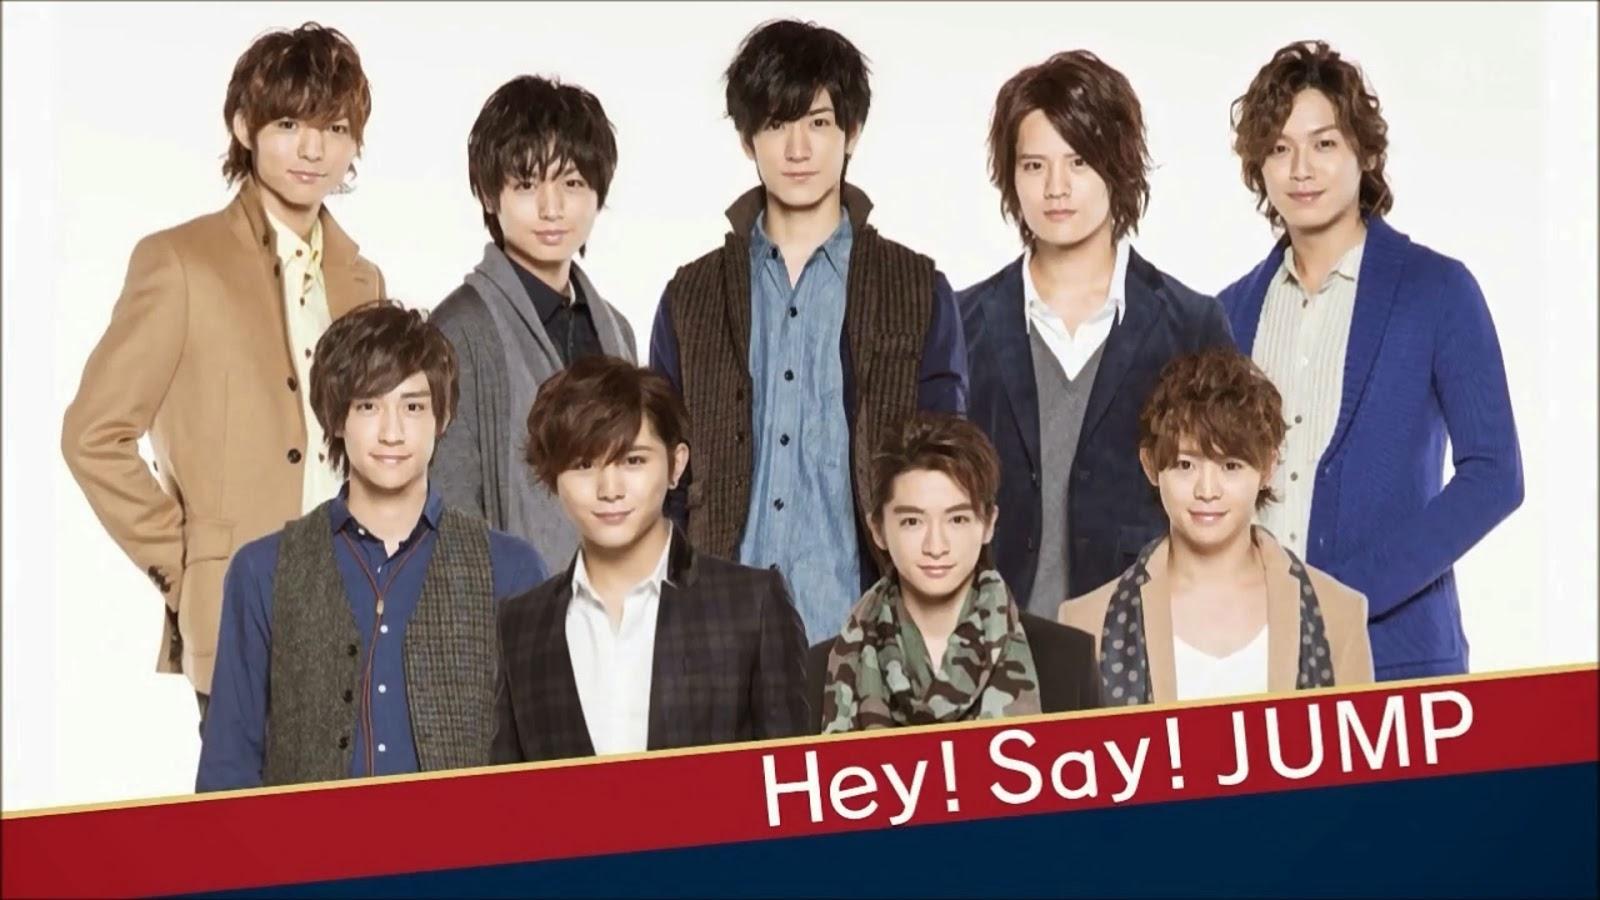 Hey! Say! JUMPの画像 p1_40